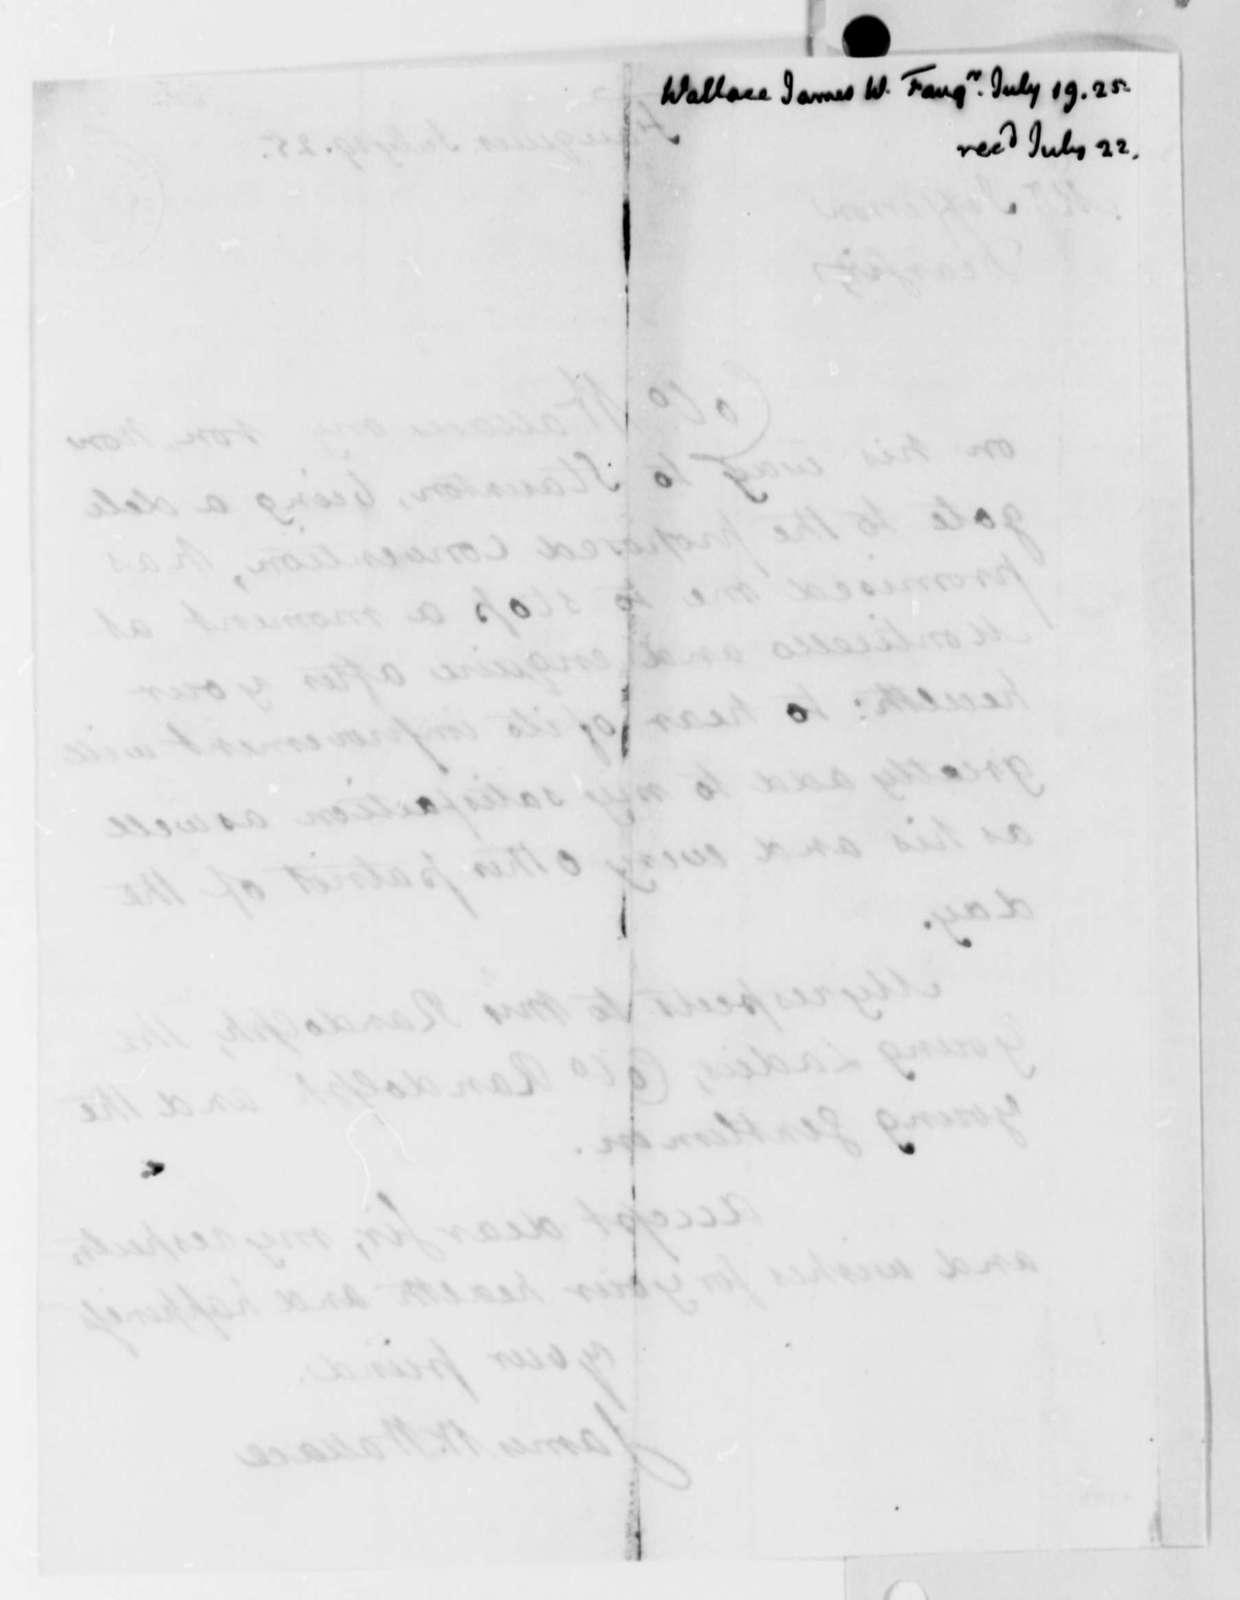 James W. Wallace to Thomas Jefferson, July 19, 1825